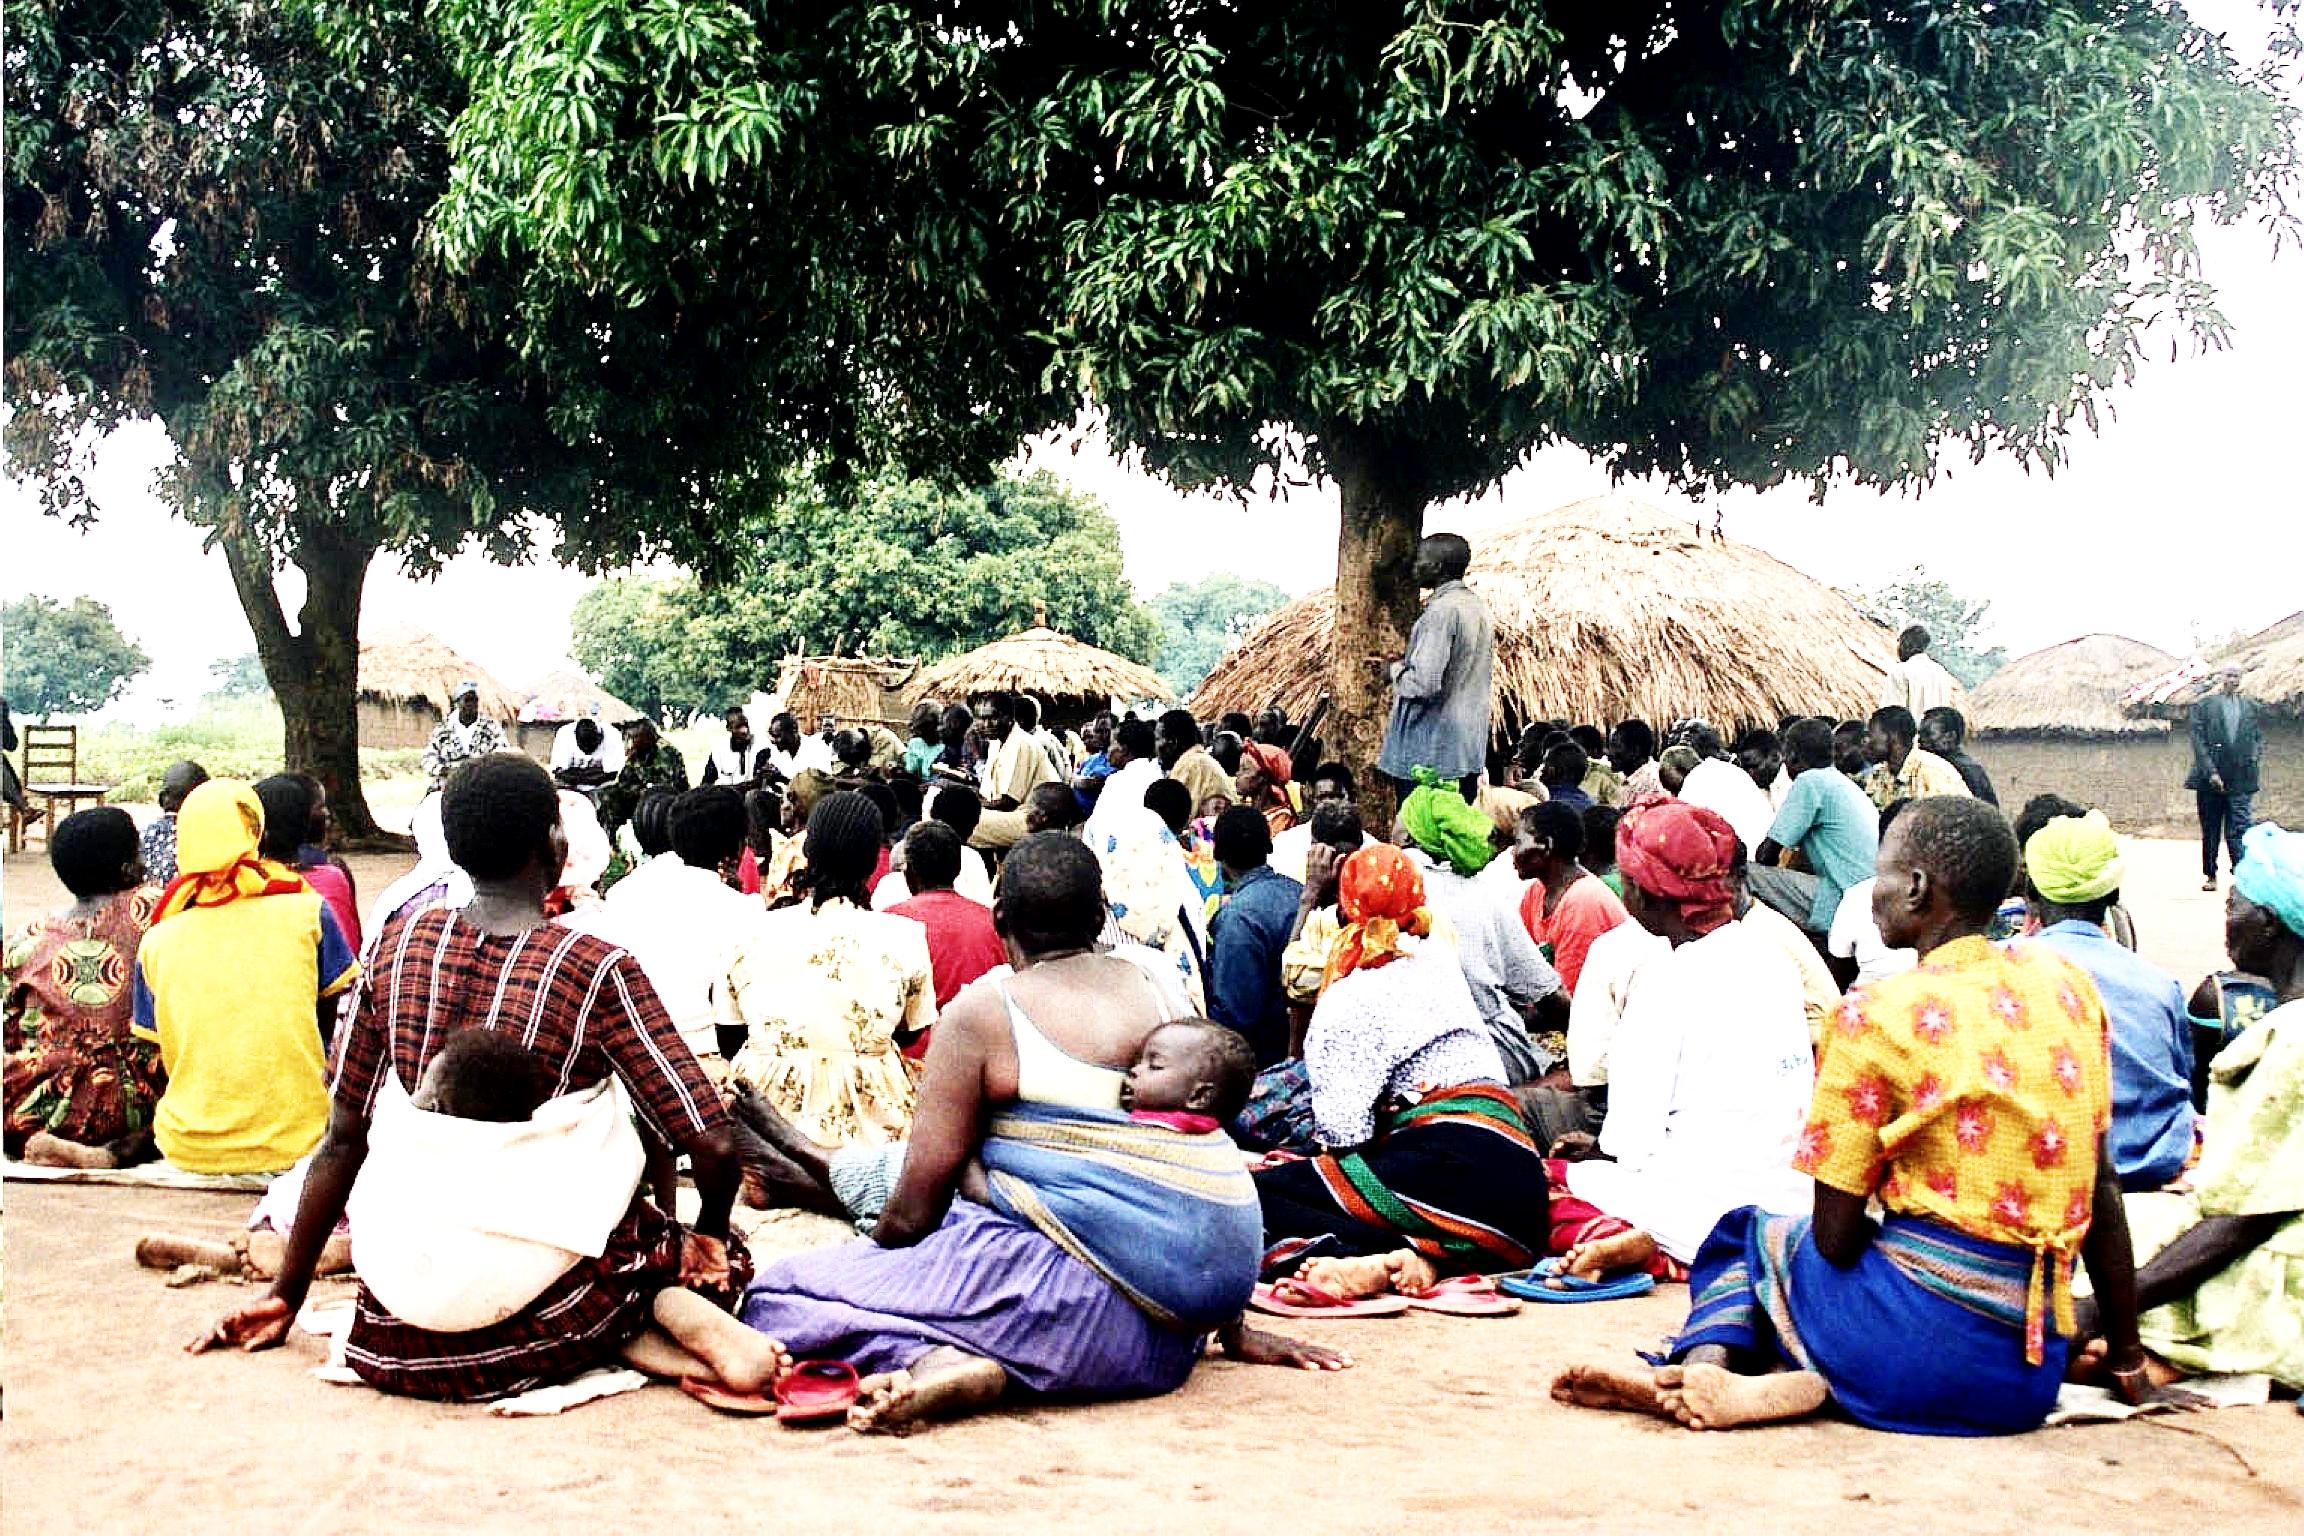 men-women-and-children-on-meeting-in-rural-village.jpg